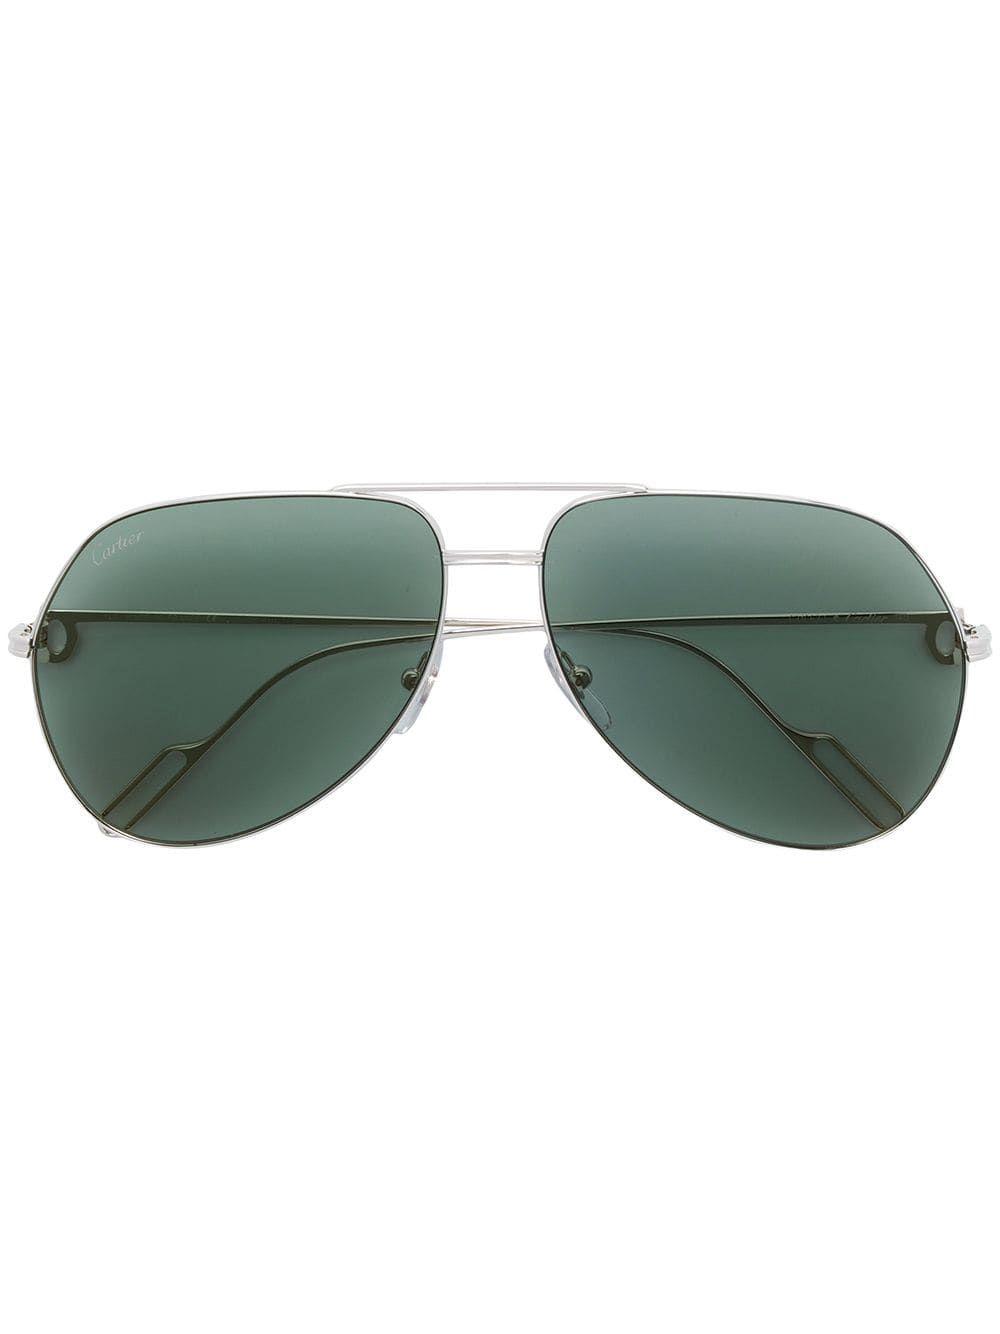 Cartier Eyewear aviator shaped sunglasses – SILVER